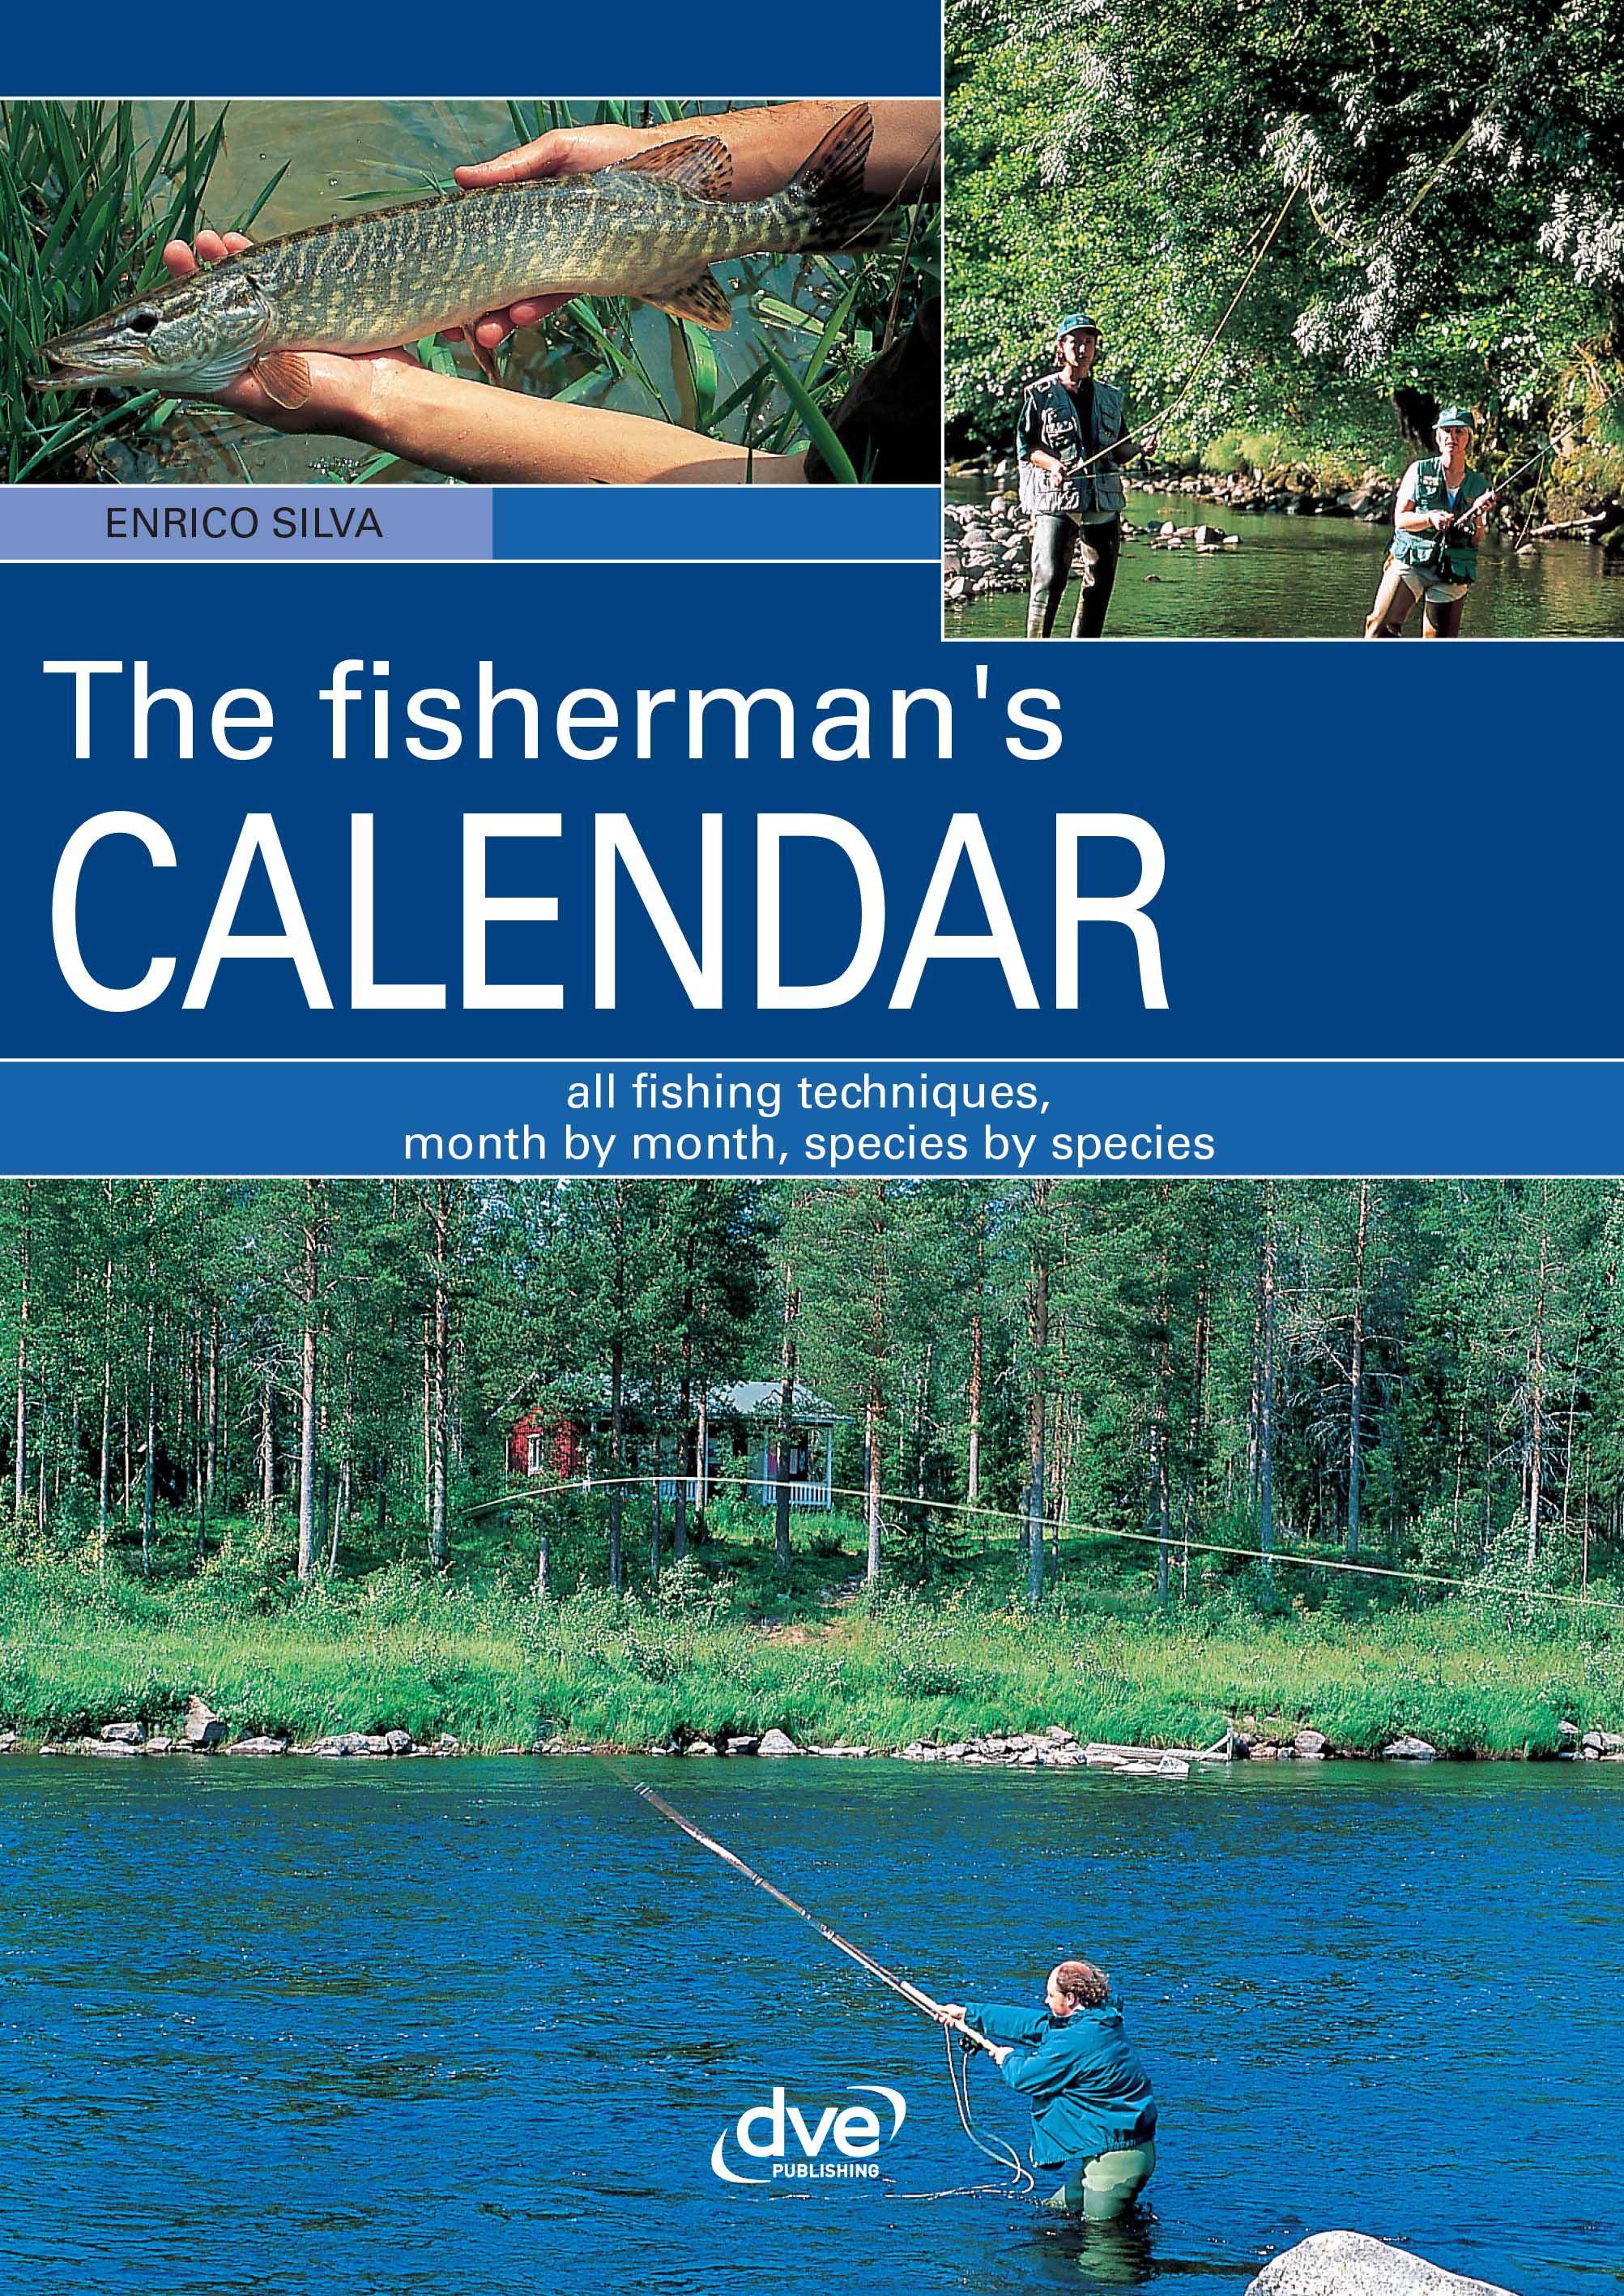 The fisherman's calendar